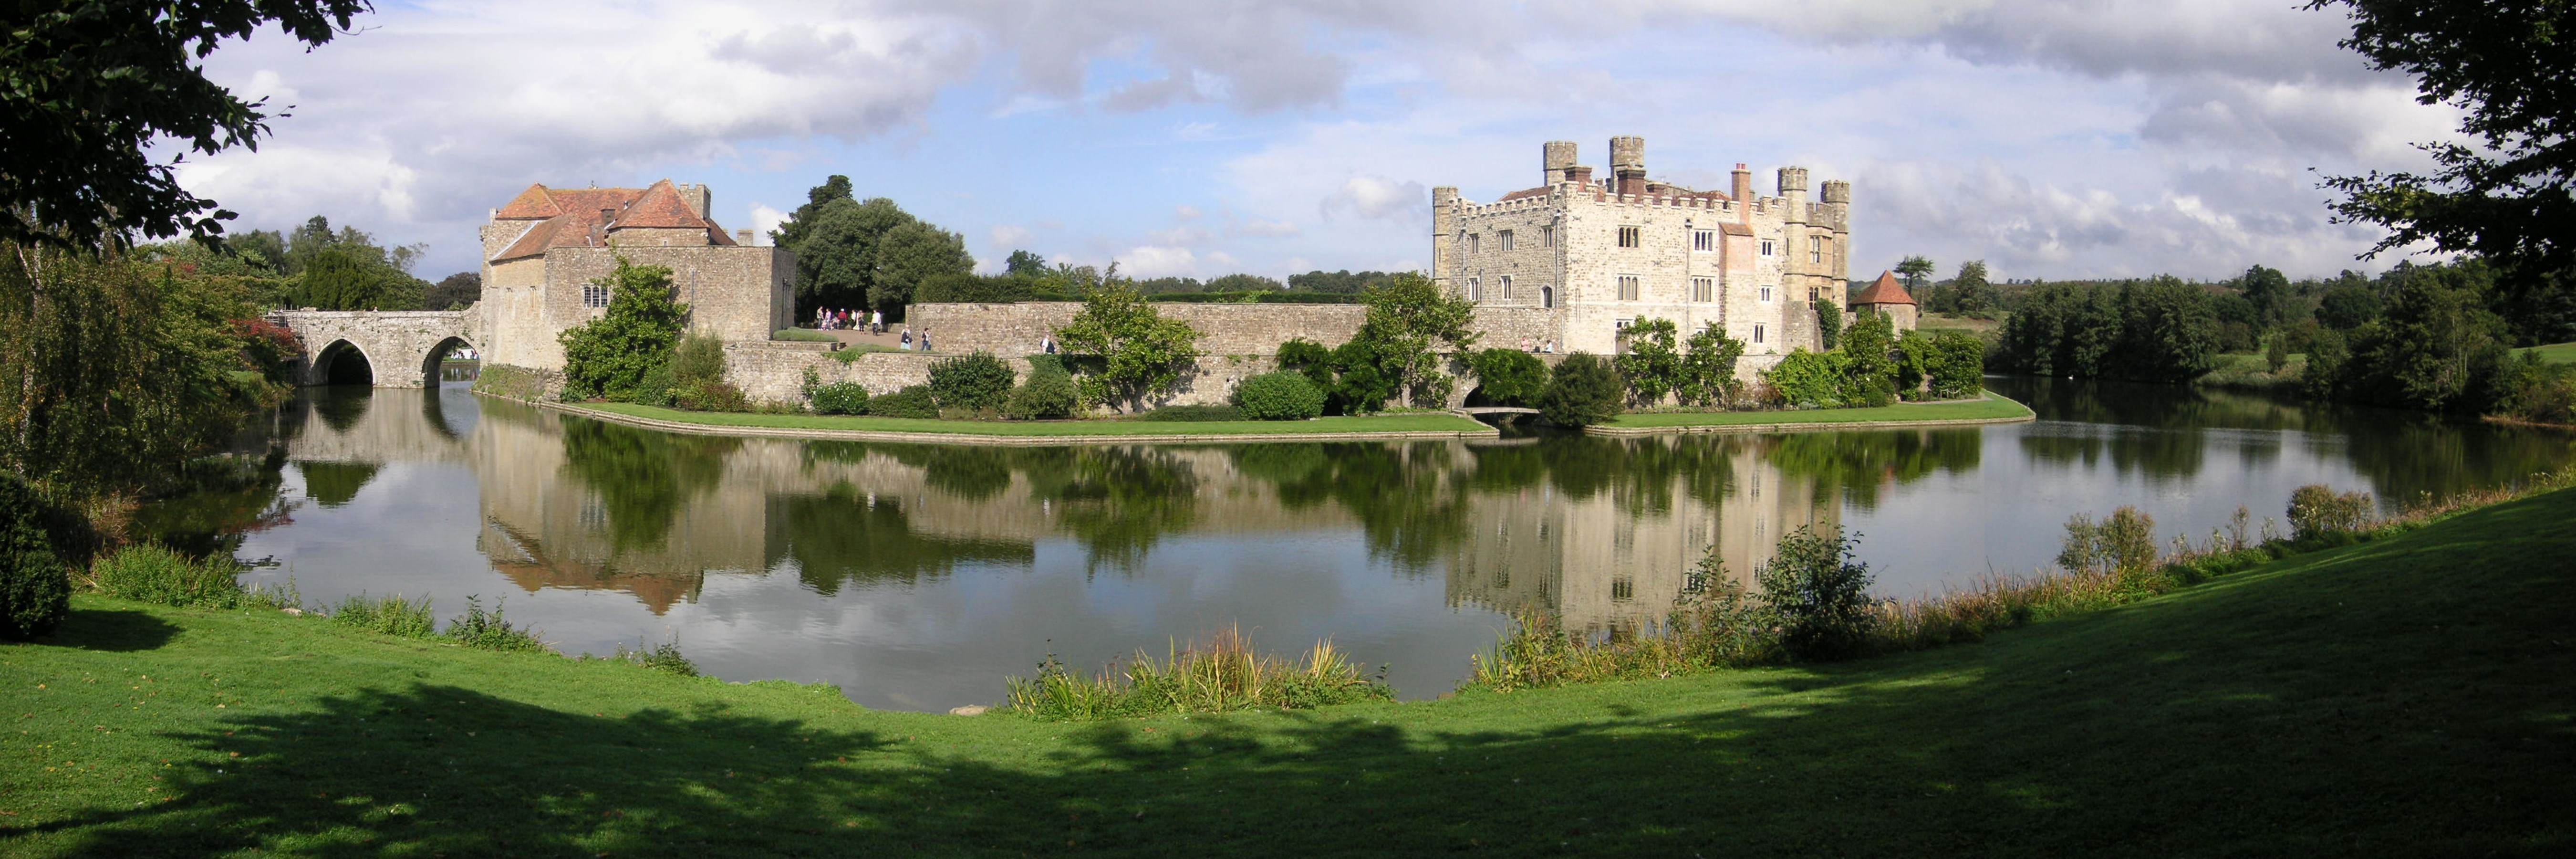 Wide angle photo of Leeds Castle